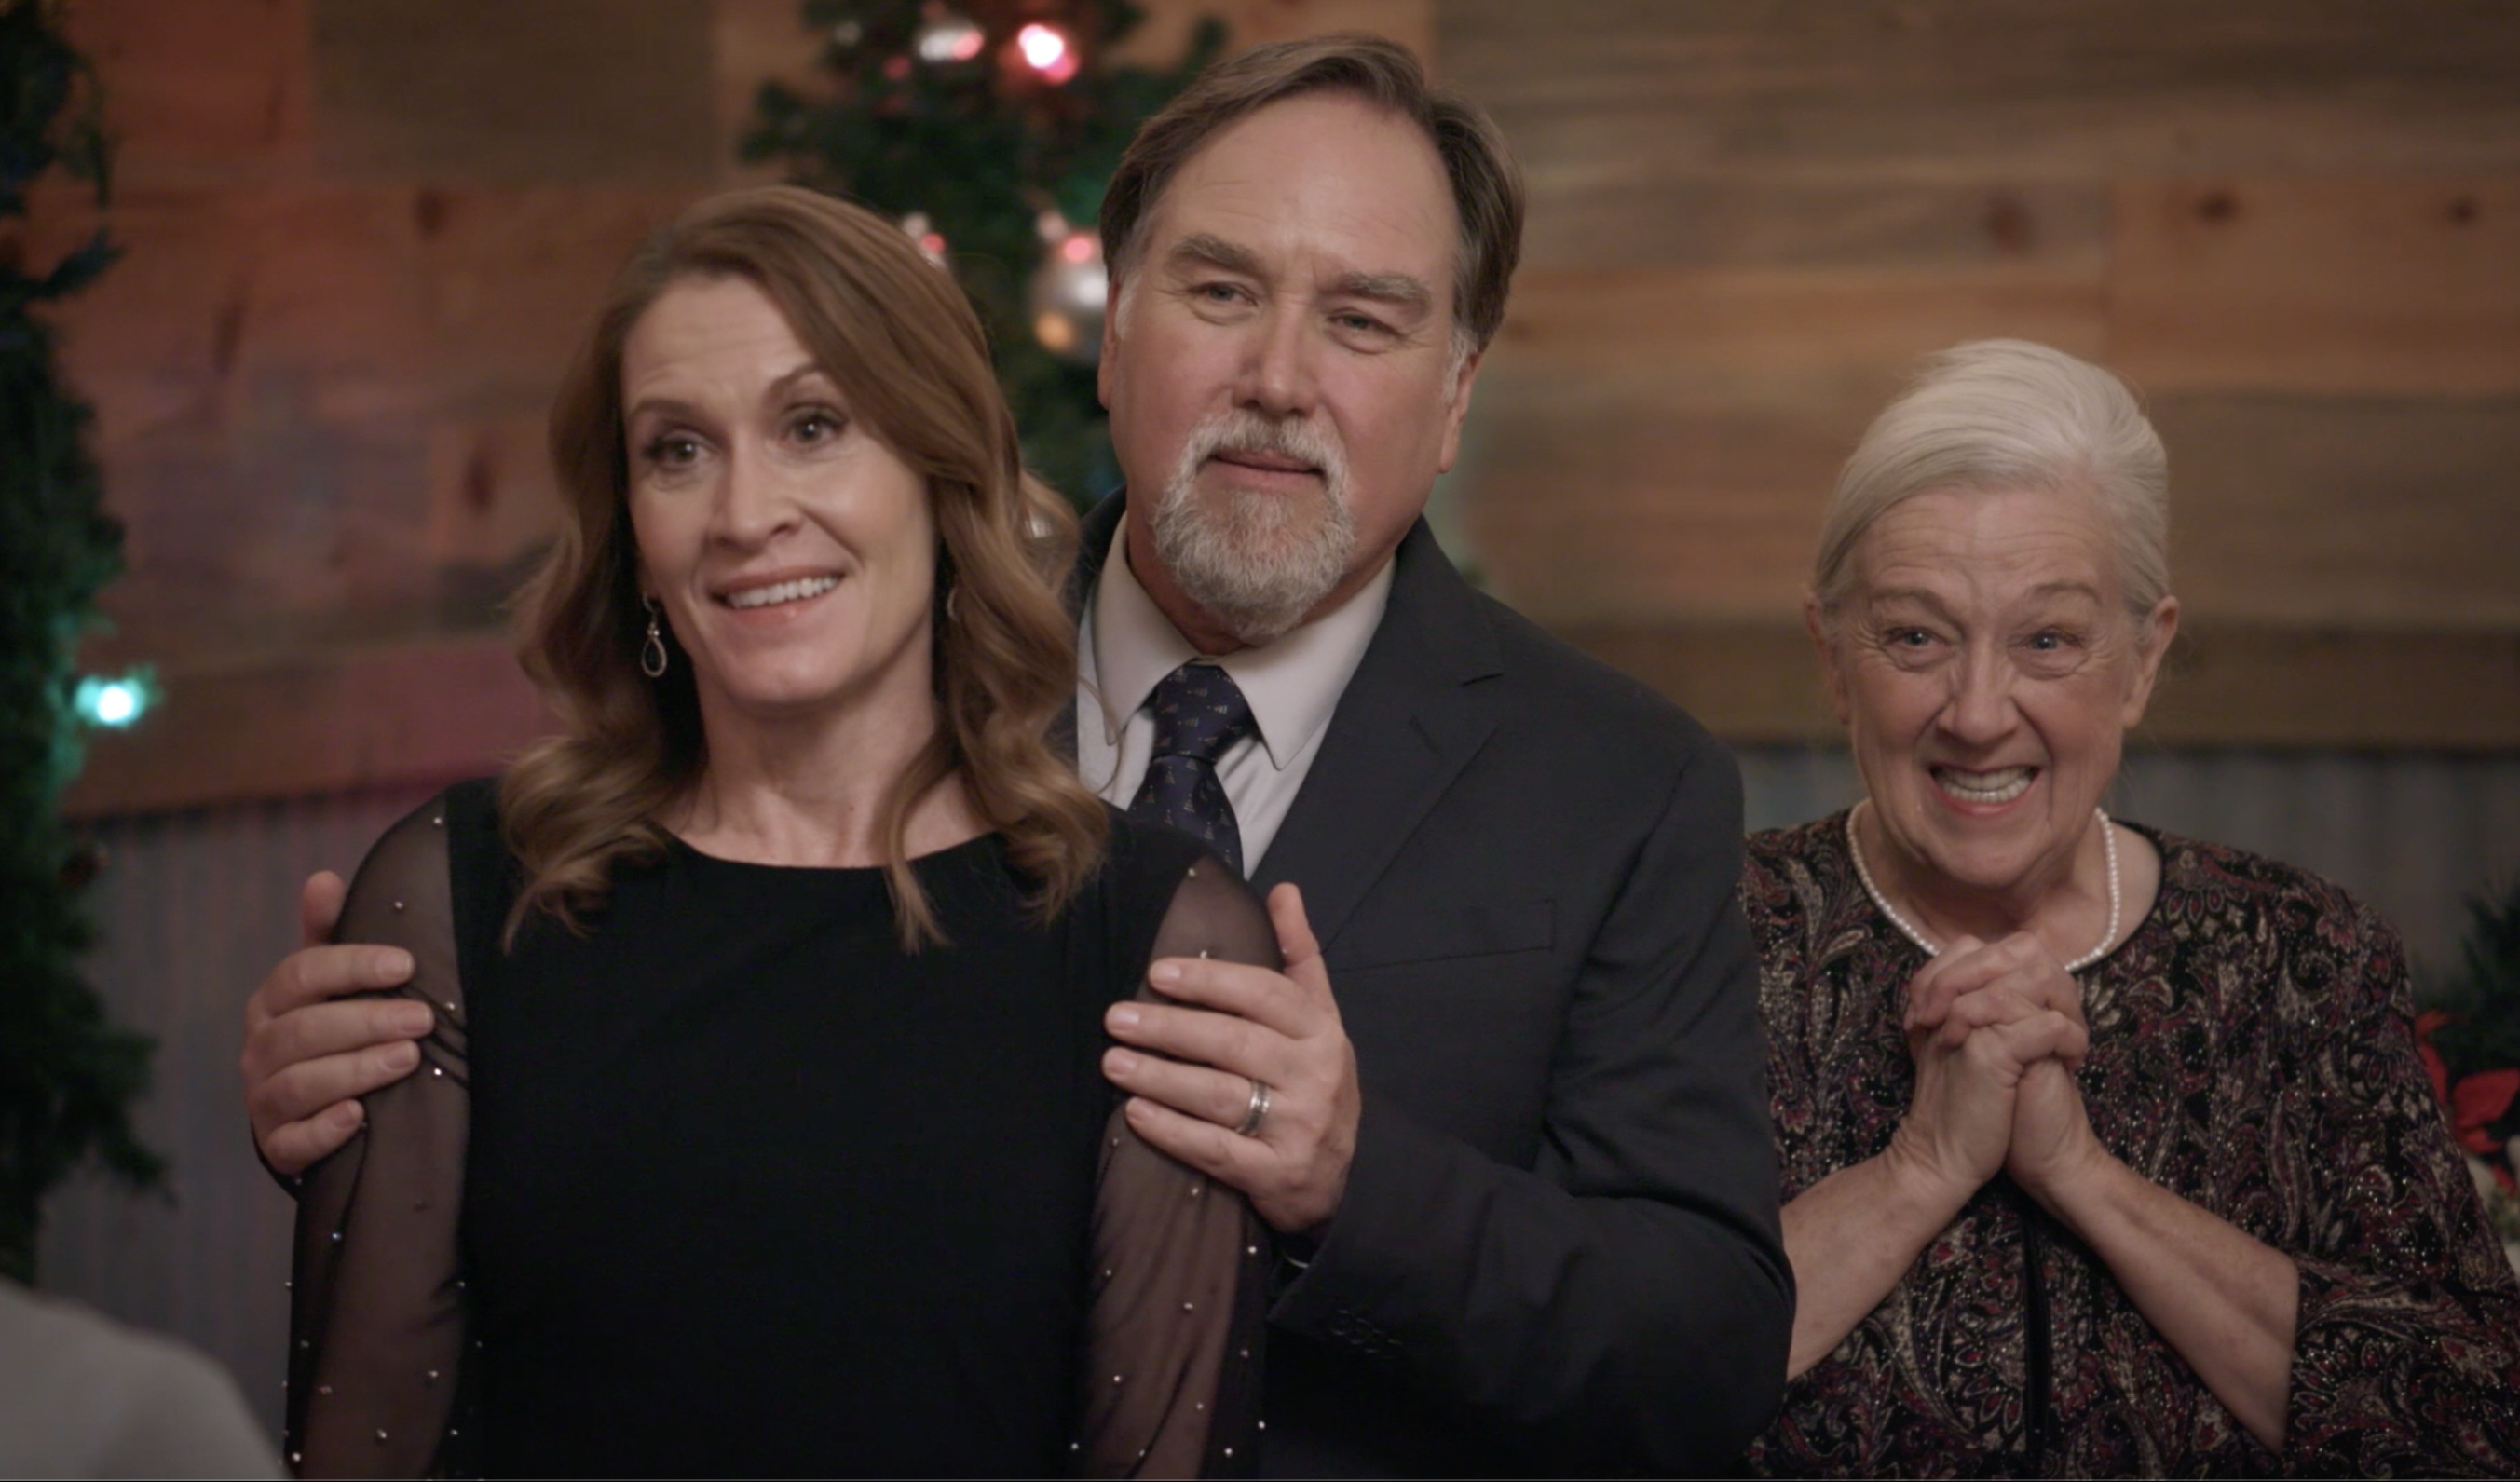 Barta Heiner, Richard Karn, and Charla Bocchicchio in Check Inn to Christmas (2019)